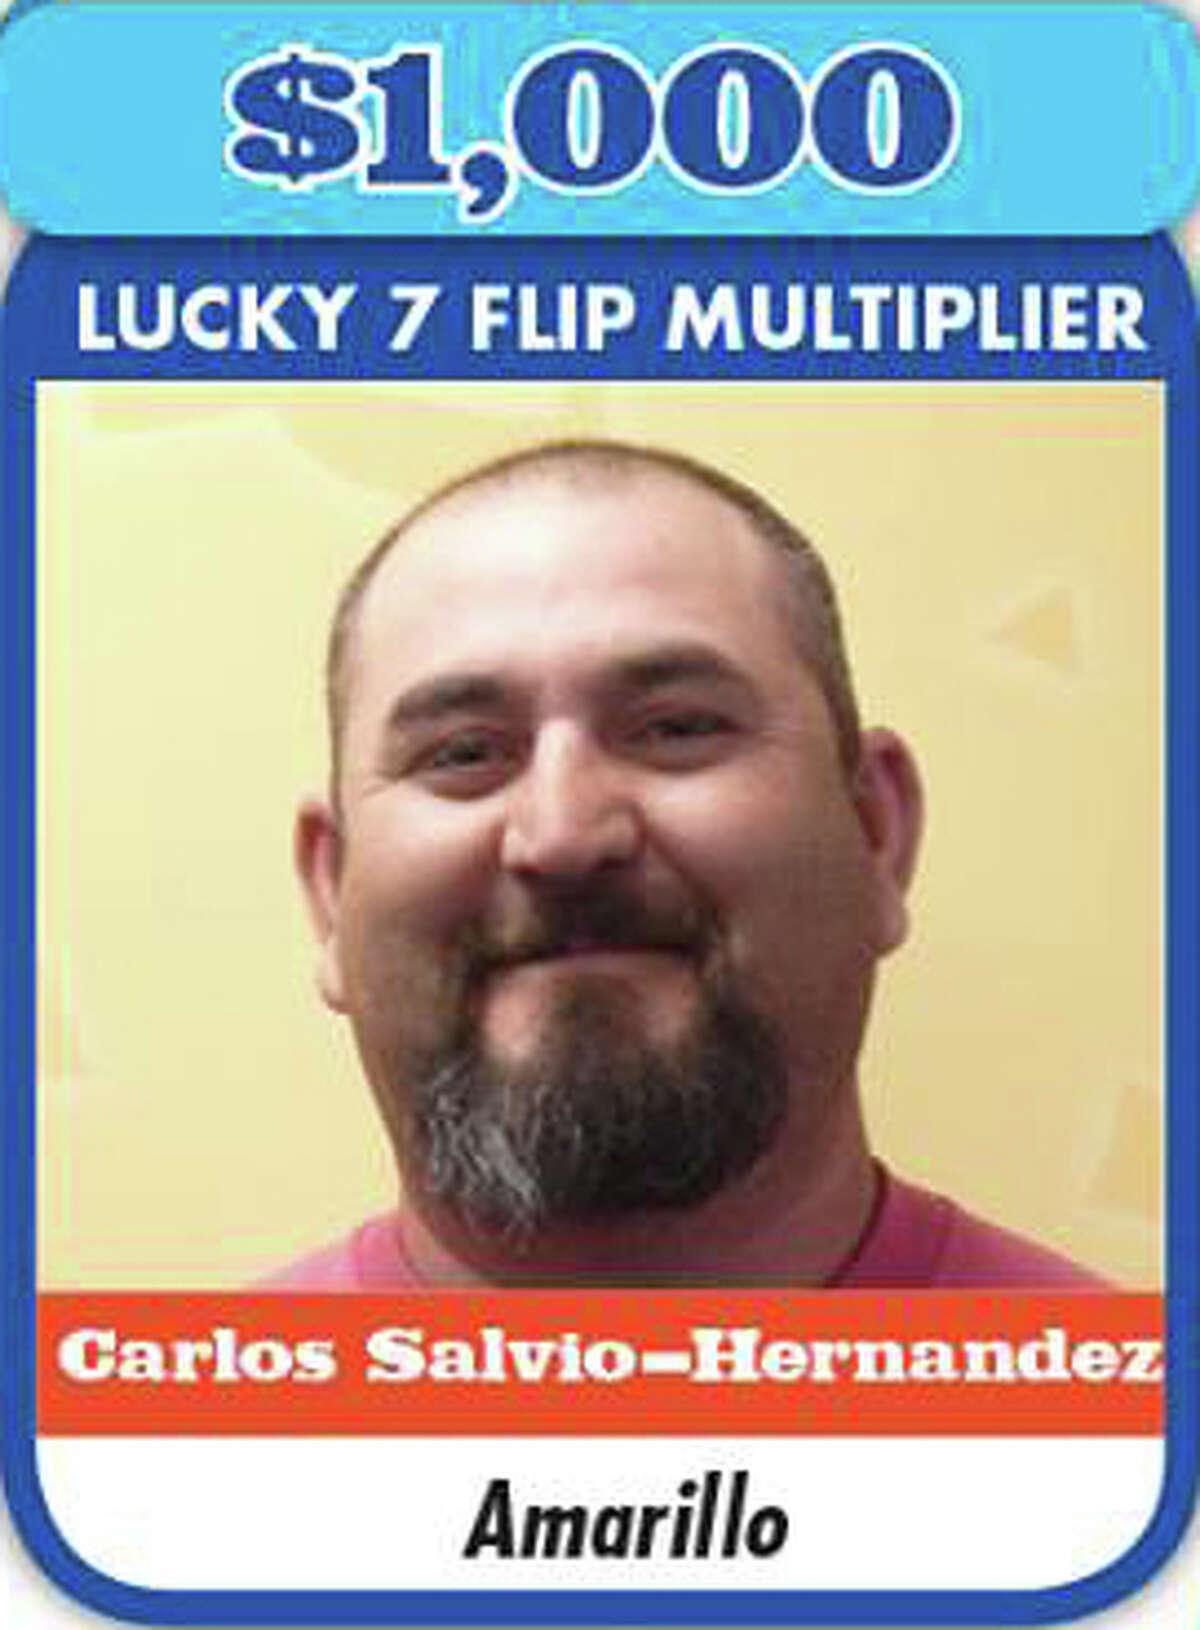 Carlos Salvio-HernandezWon: $1,000Where: Amarillo